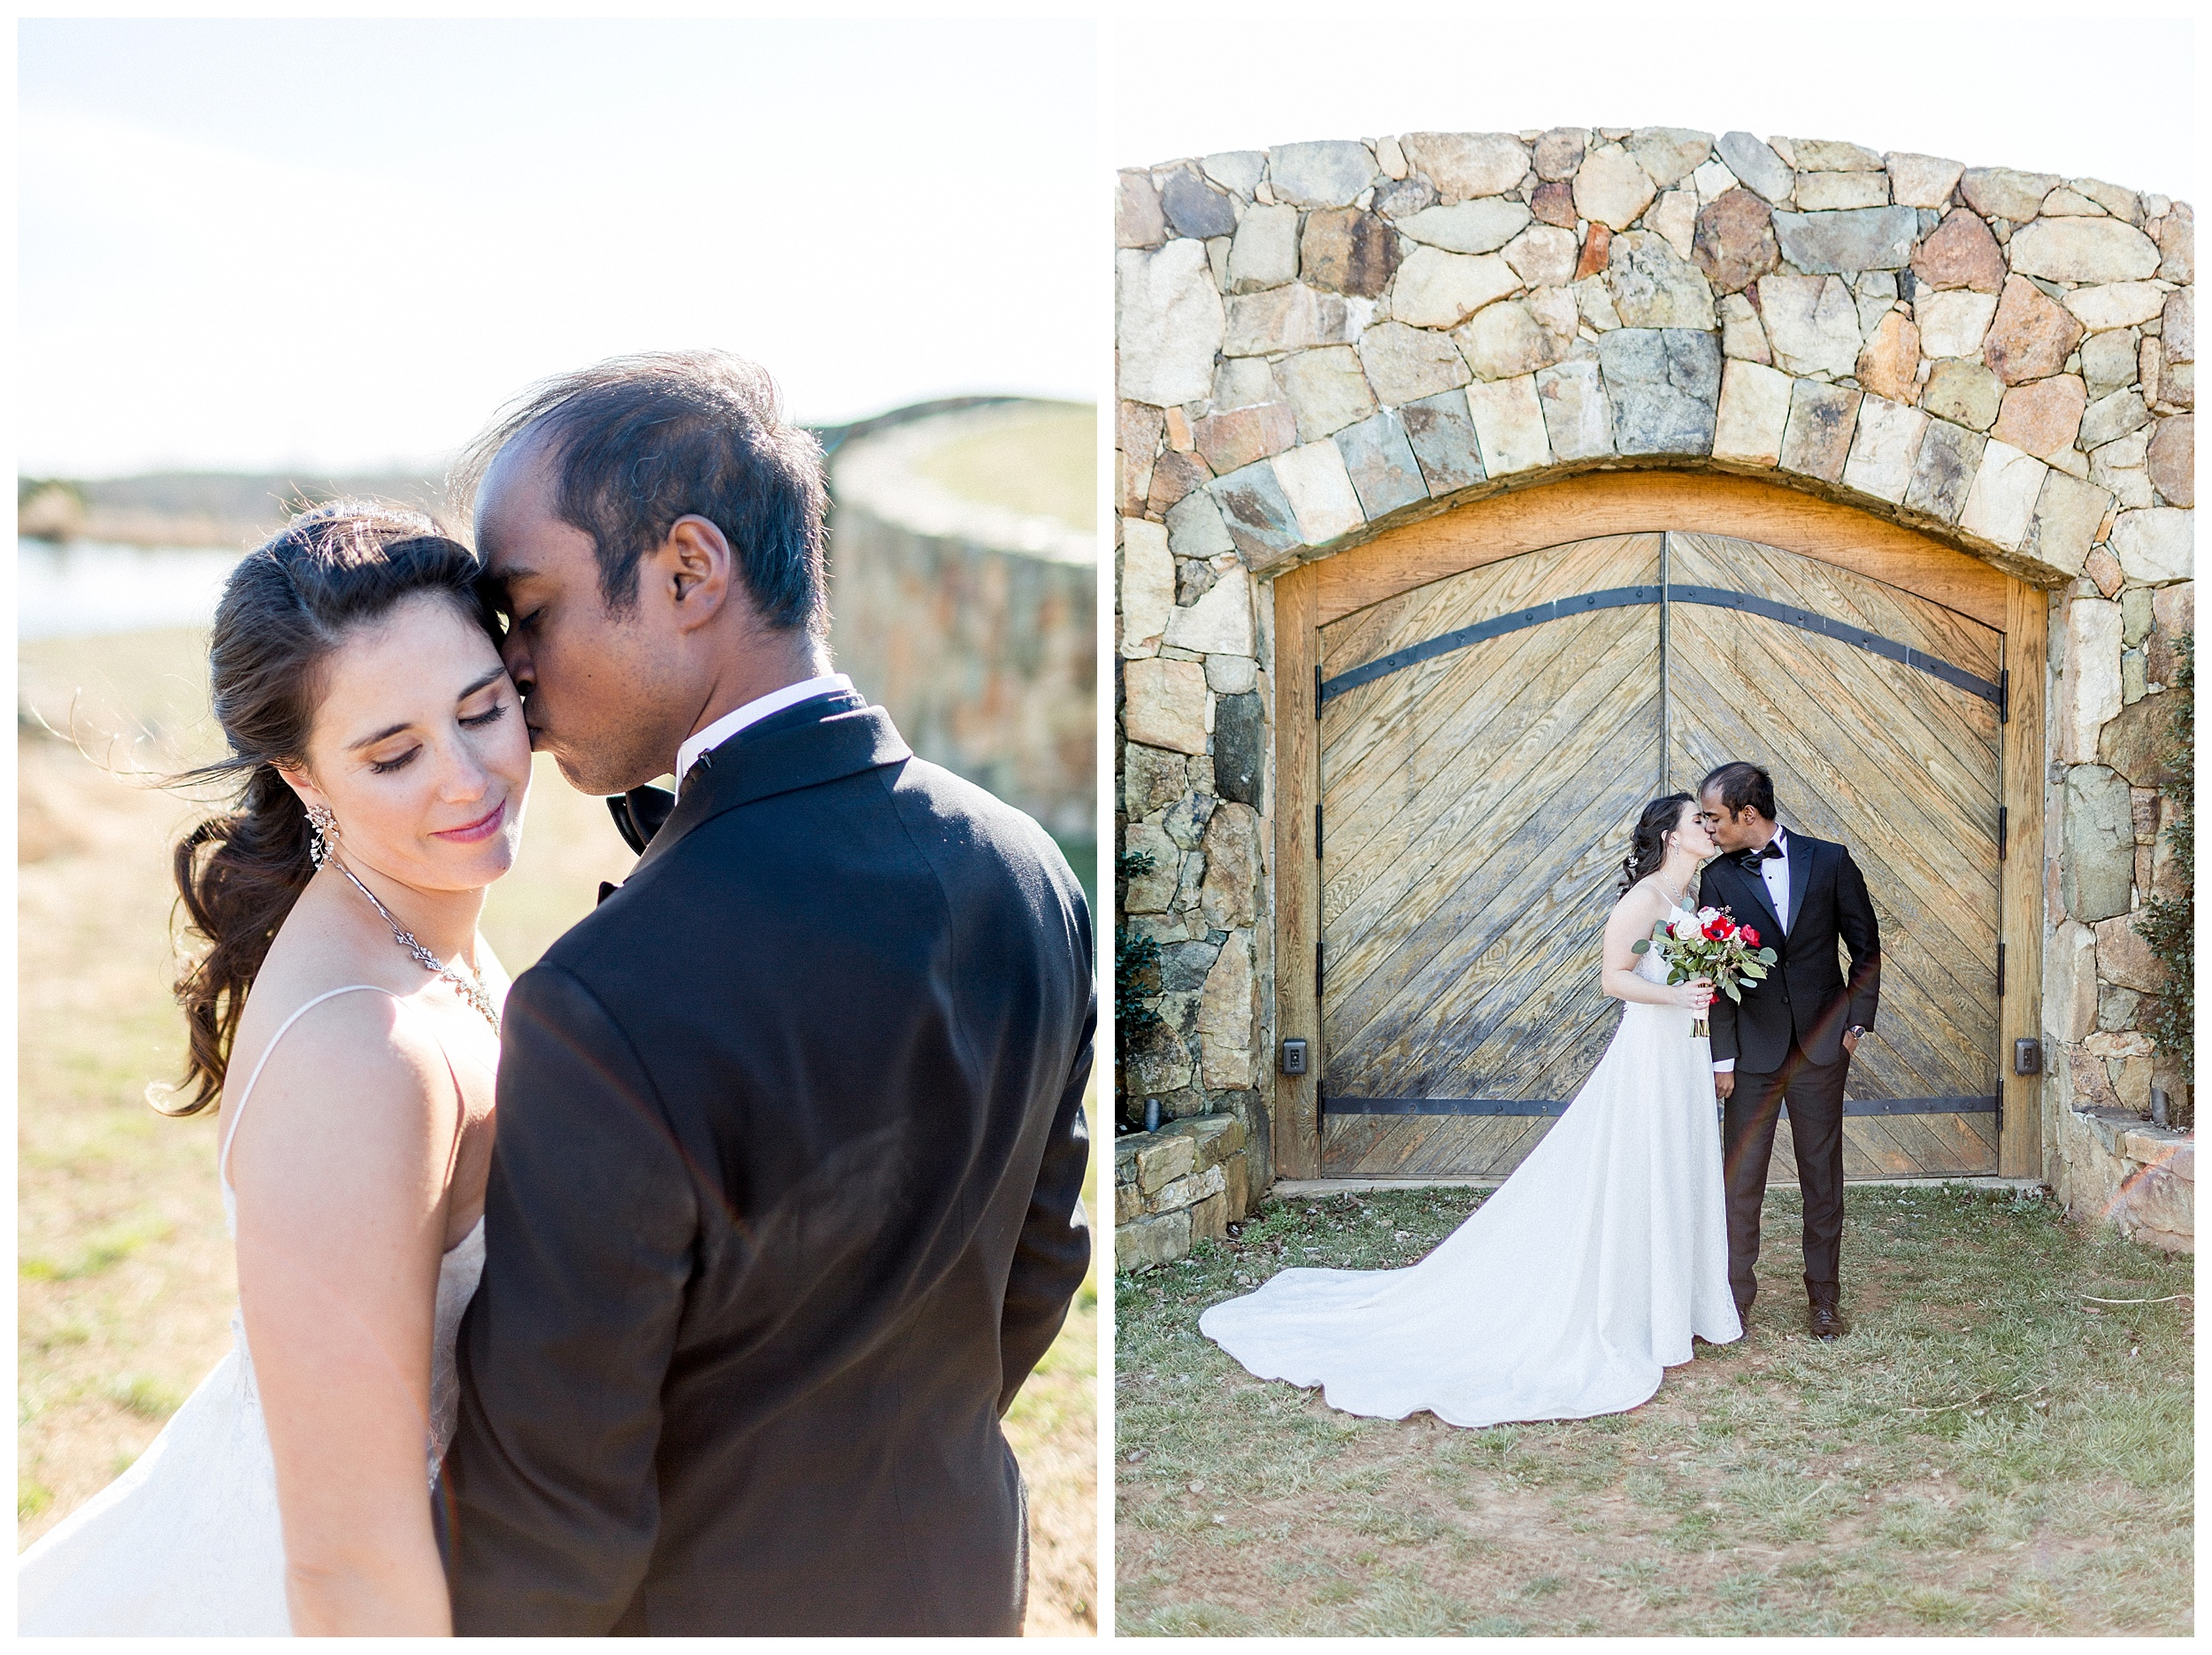 Stone Tower Winery Wedding | Virginia Winter Wedding | VA Wedding Photographer Kir Tuben_0051.jpg